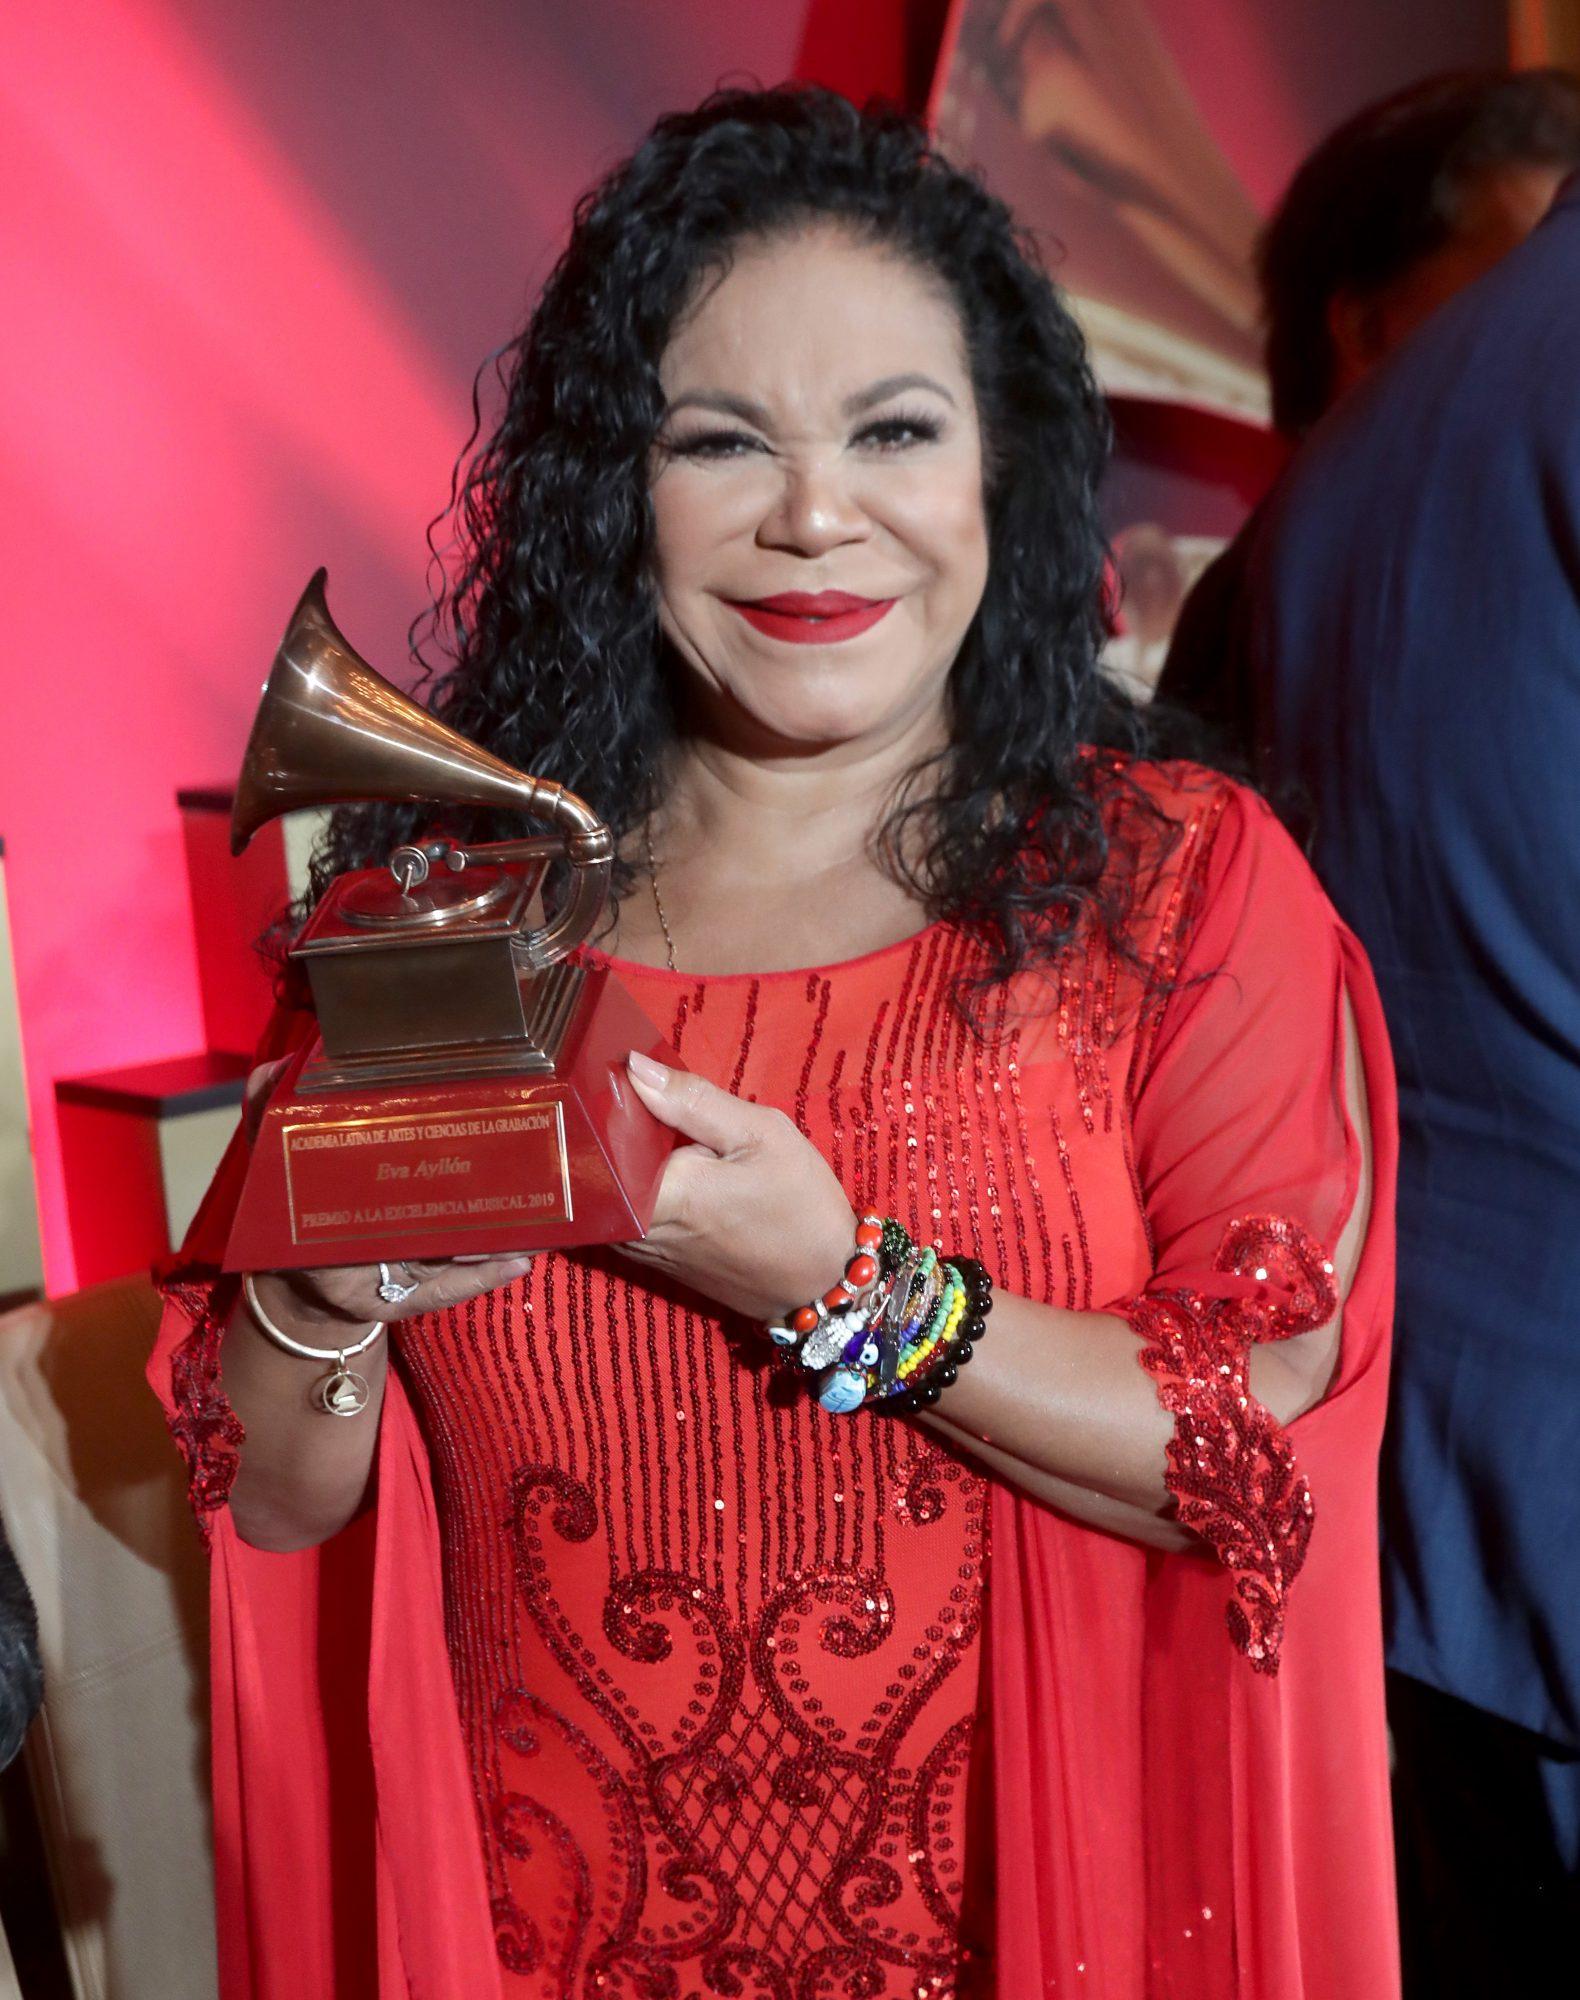 The 20th Annual Latin GRAMMY Awards - Special Awards Presentation